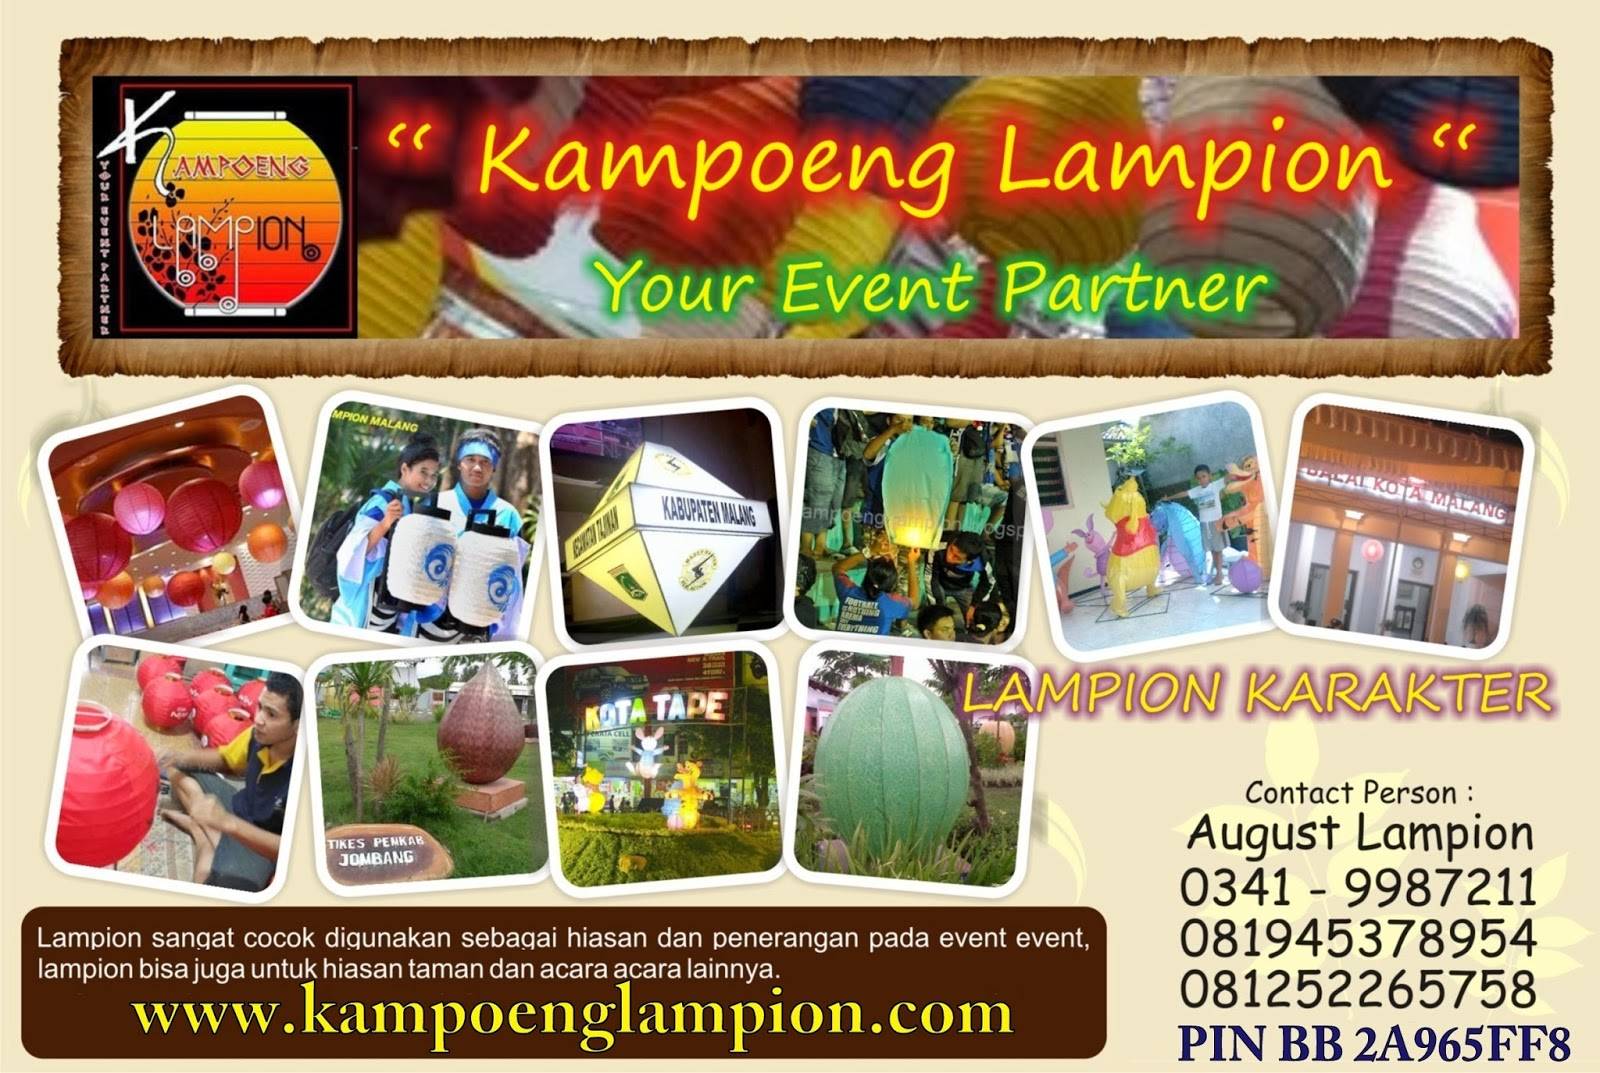 http://www.singoedannews.com//read/626/kampoeng-lampion-pembuat-lampion-di-kota-malang